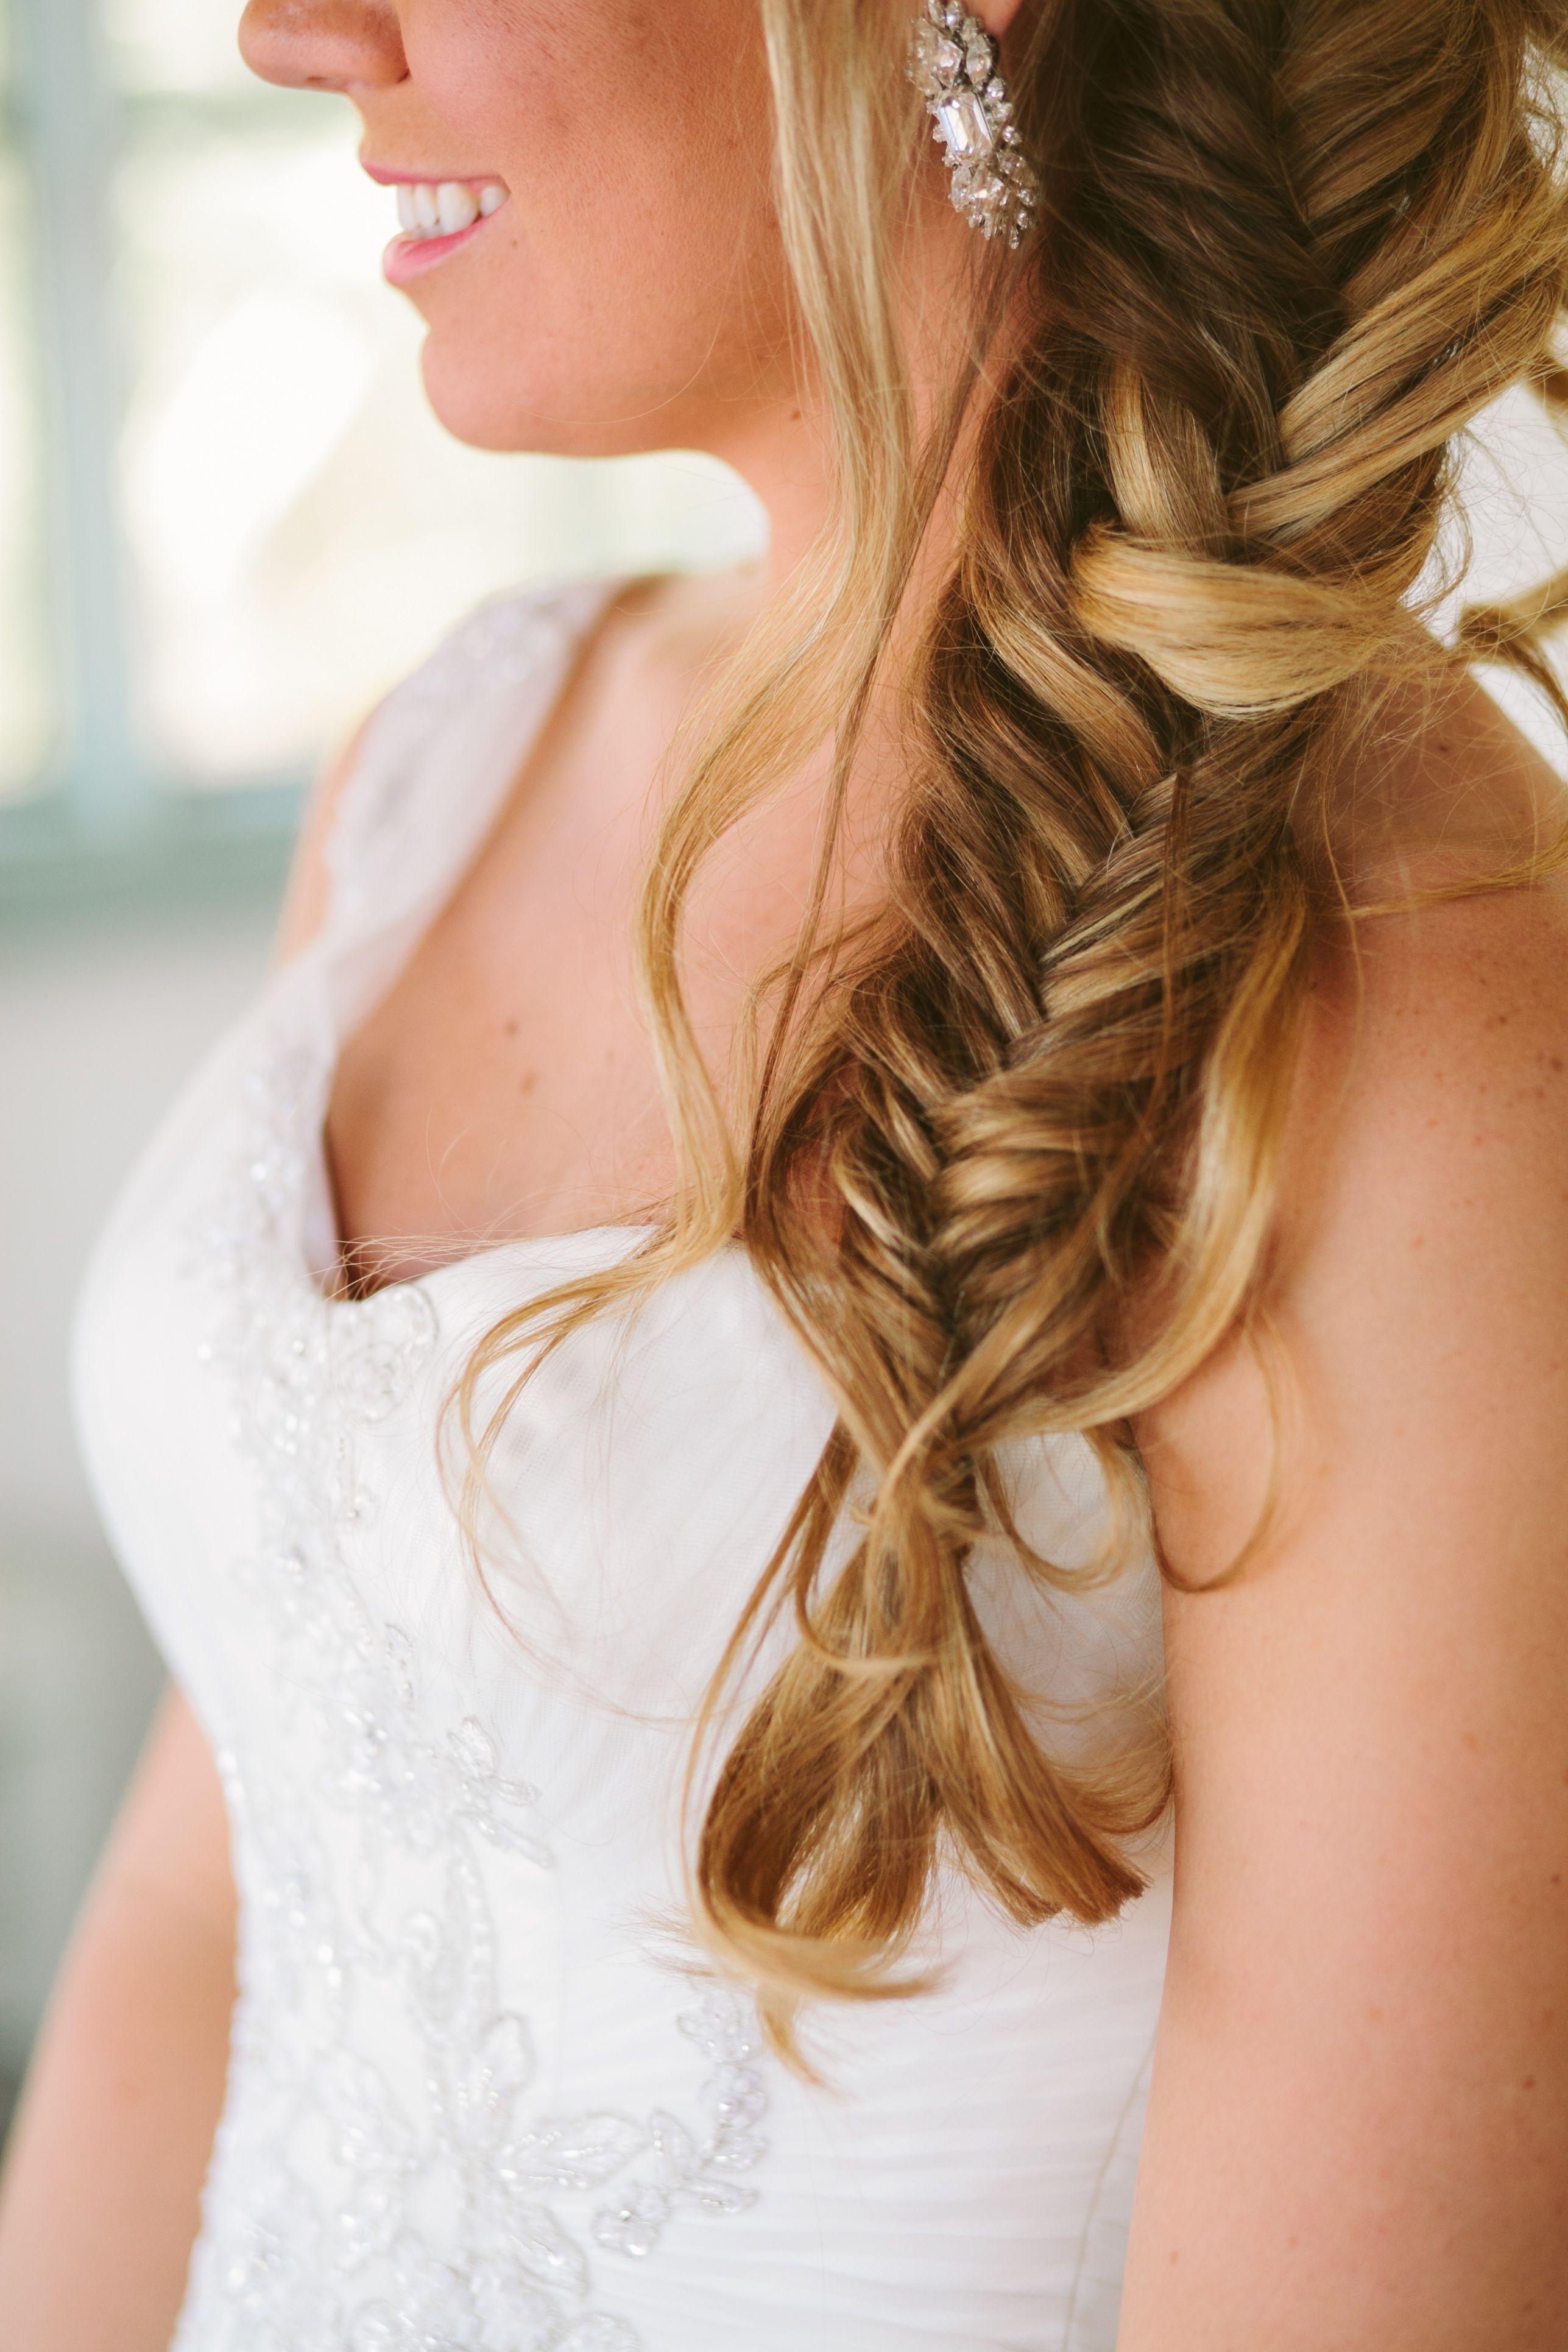 Pin By Kim Mattina On Senior Girls Hair Styles Cool Braid Hairstyles Bridal Hairdo